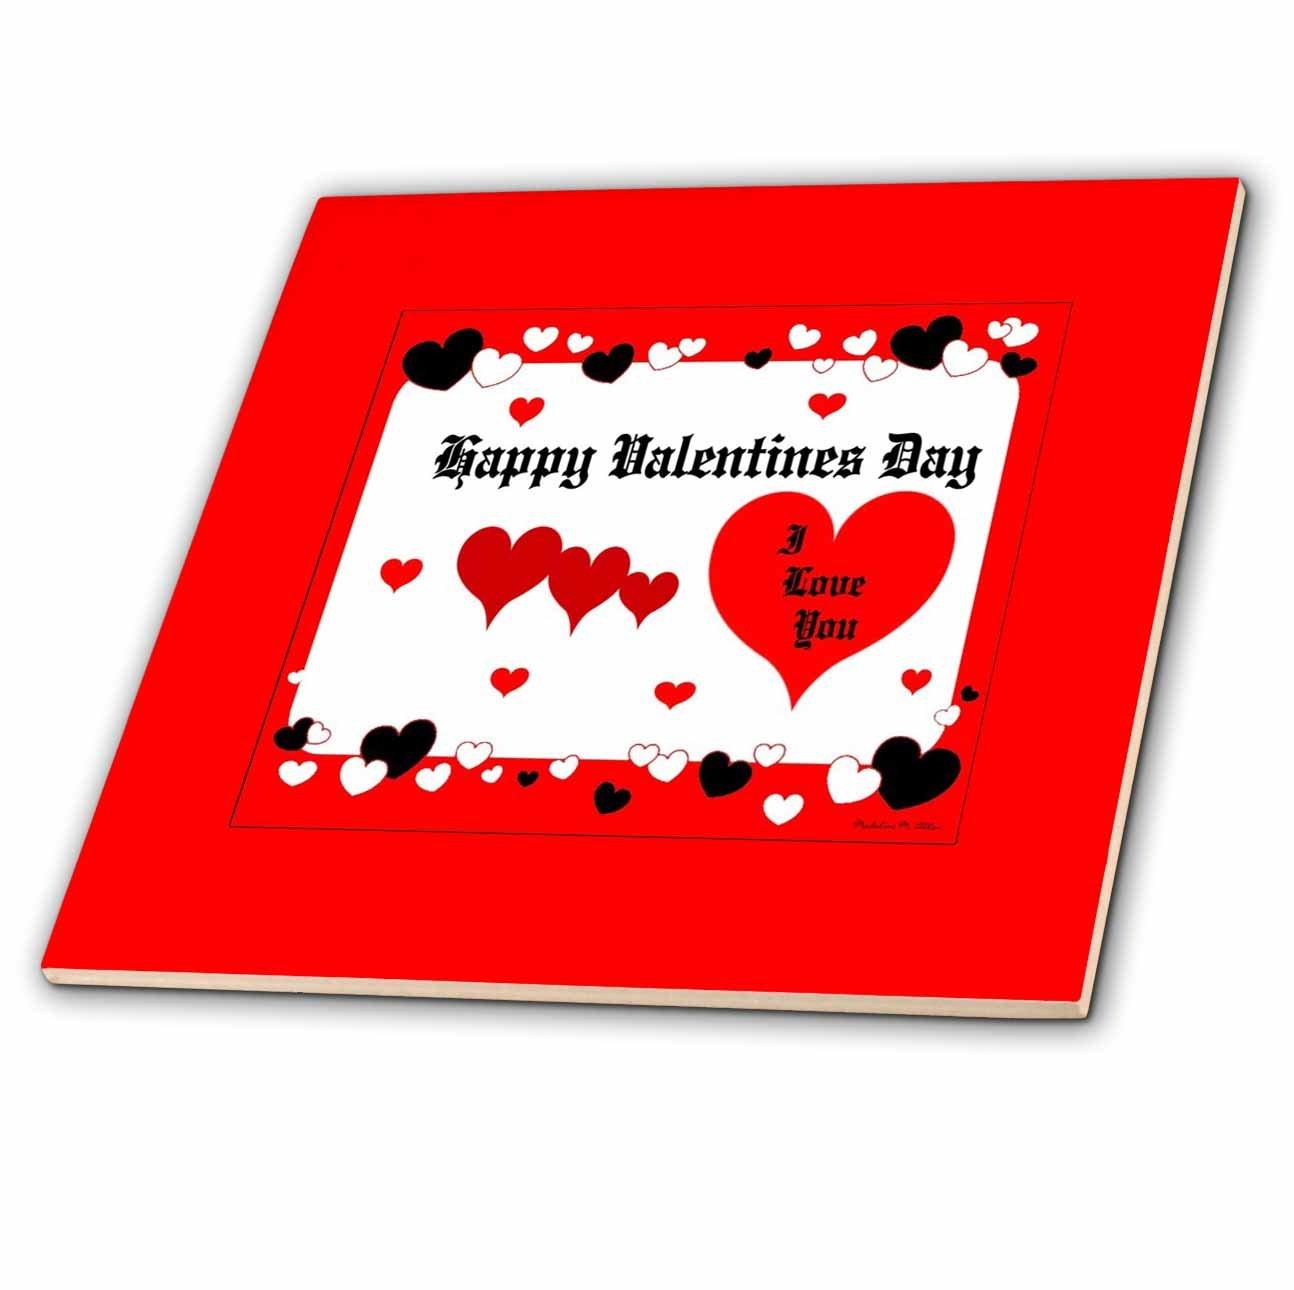 12 Inch Ceramic Tile ct/_9242/_4 3dRose SmudgeArt Valentine Designs Happy Valentines Day